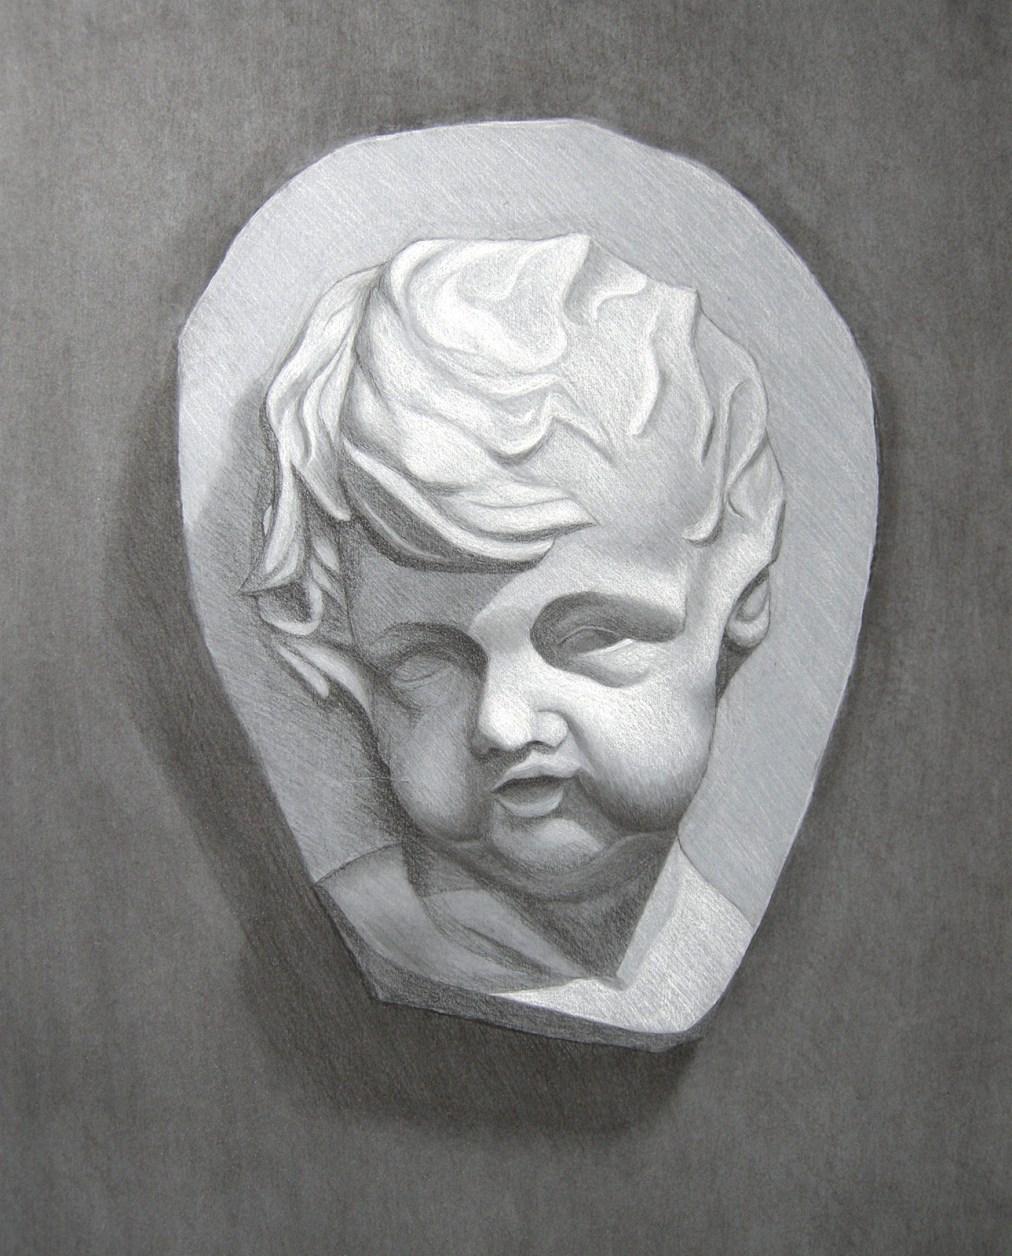 Cherub by Tatyana Deniz, charcoal and chalk on paper, 2011